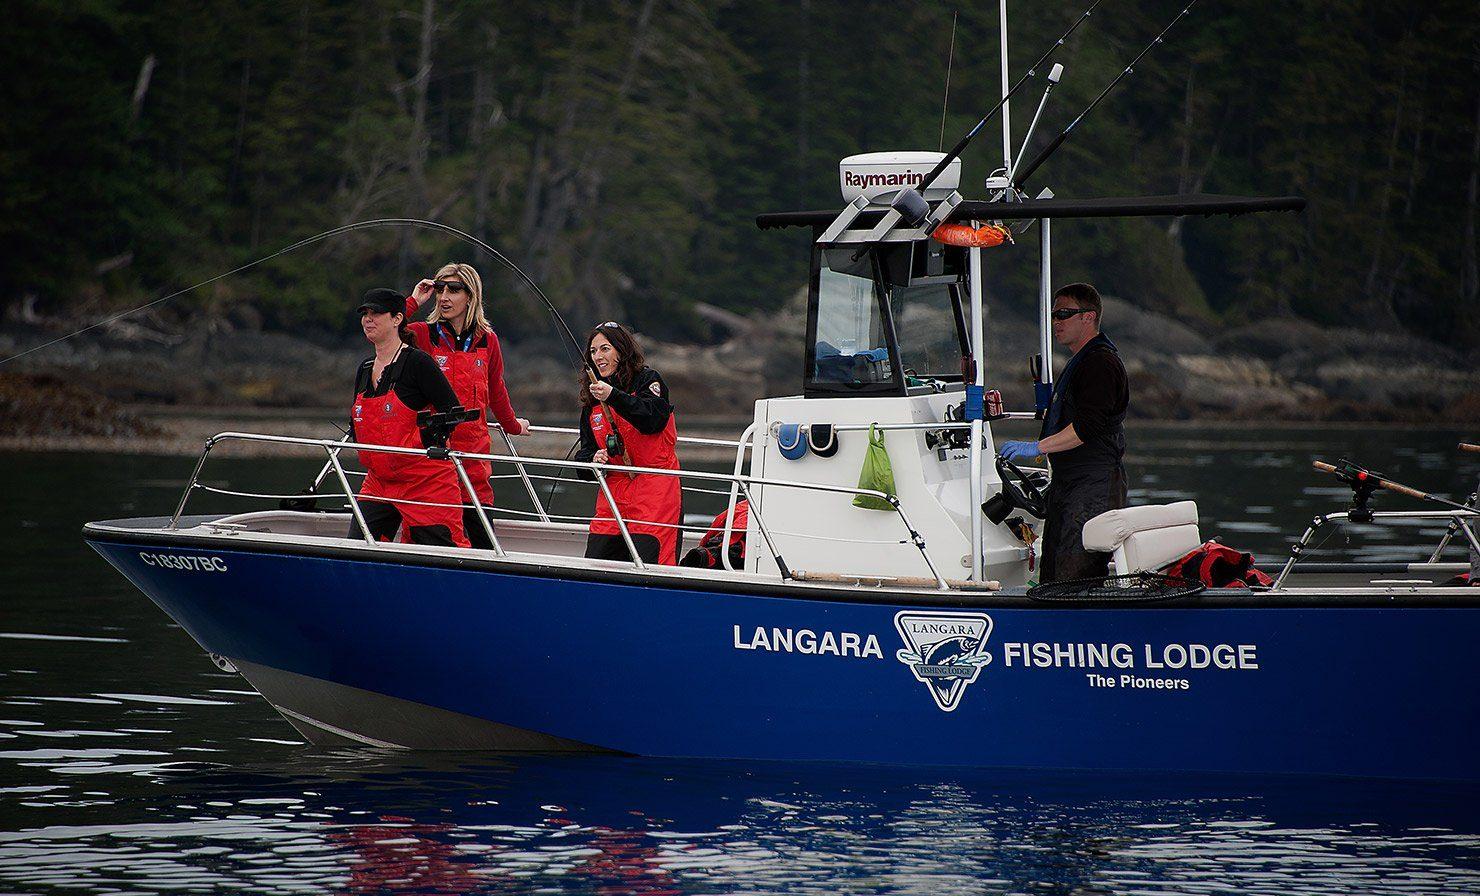 Heaven on earth for serious salmon seekers langara for Langara fishing lodge